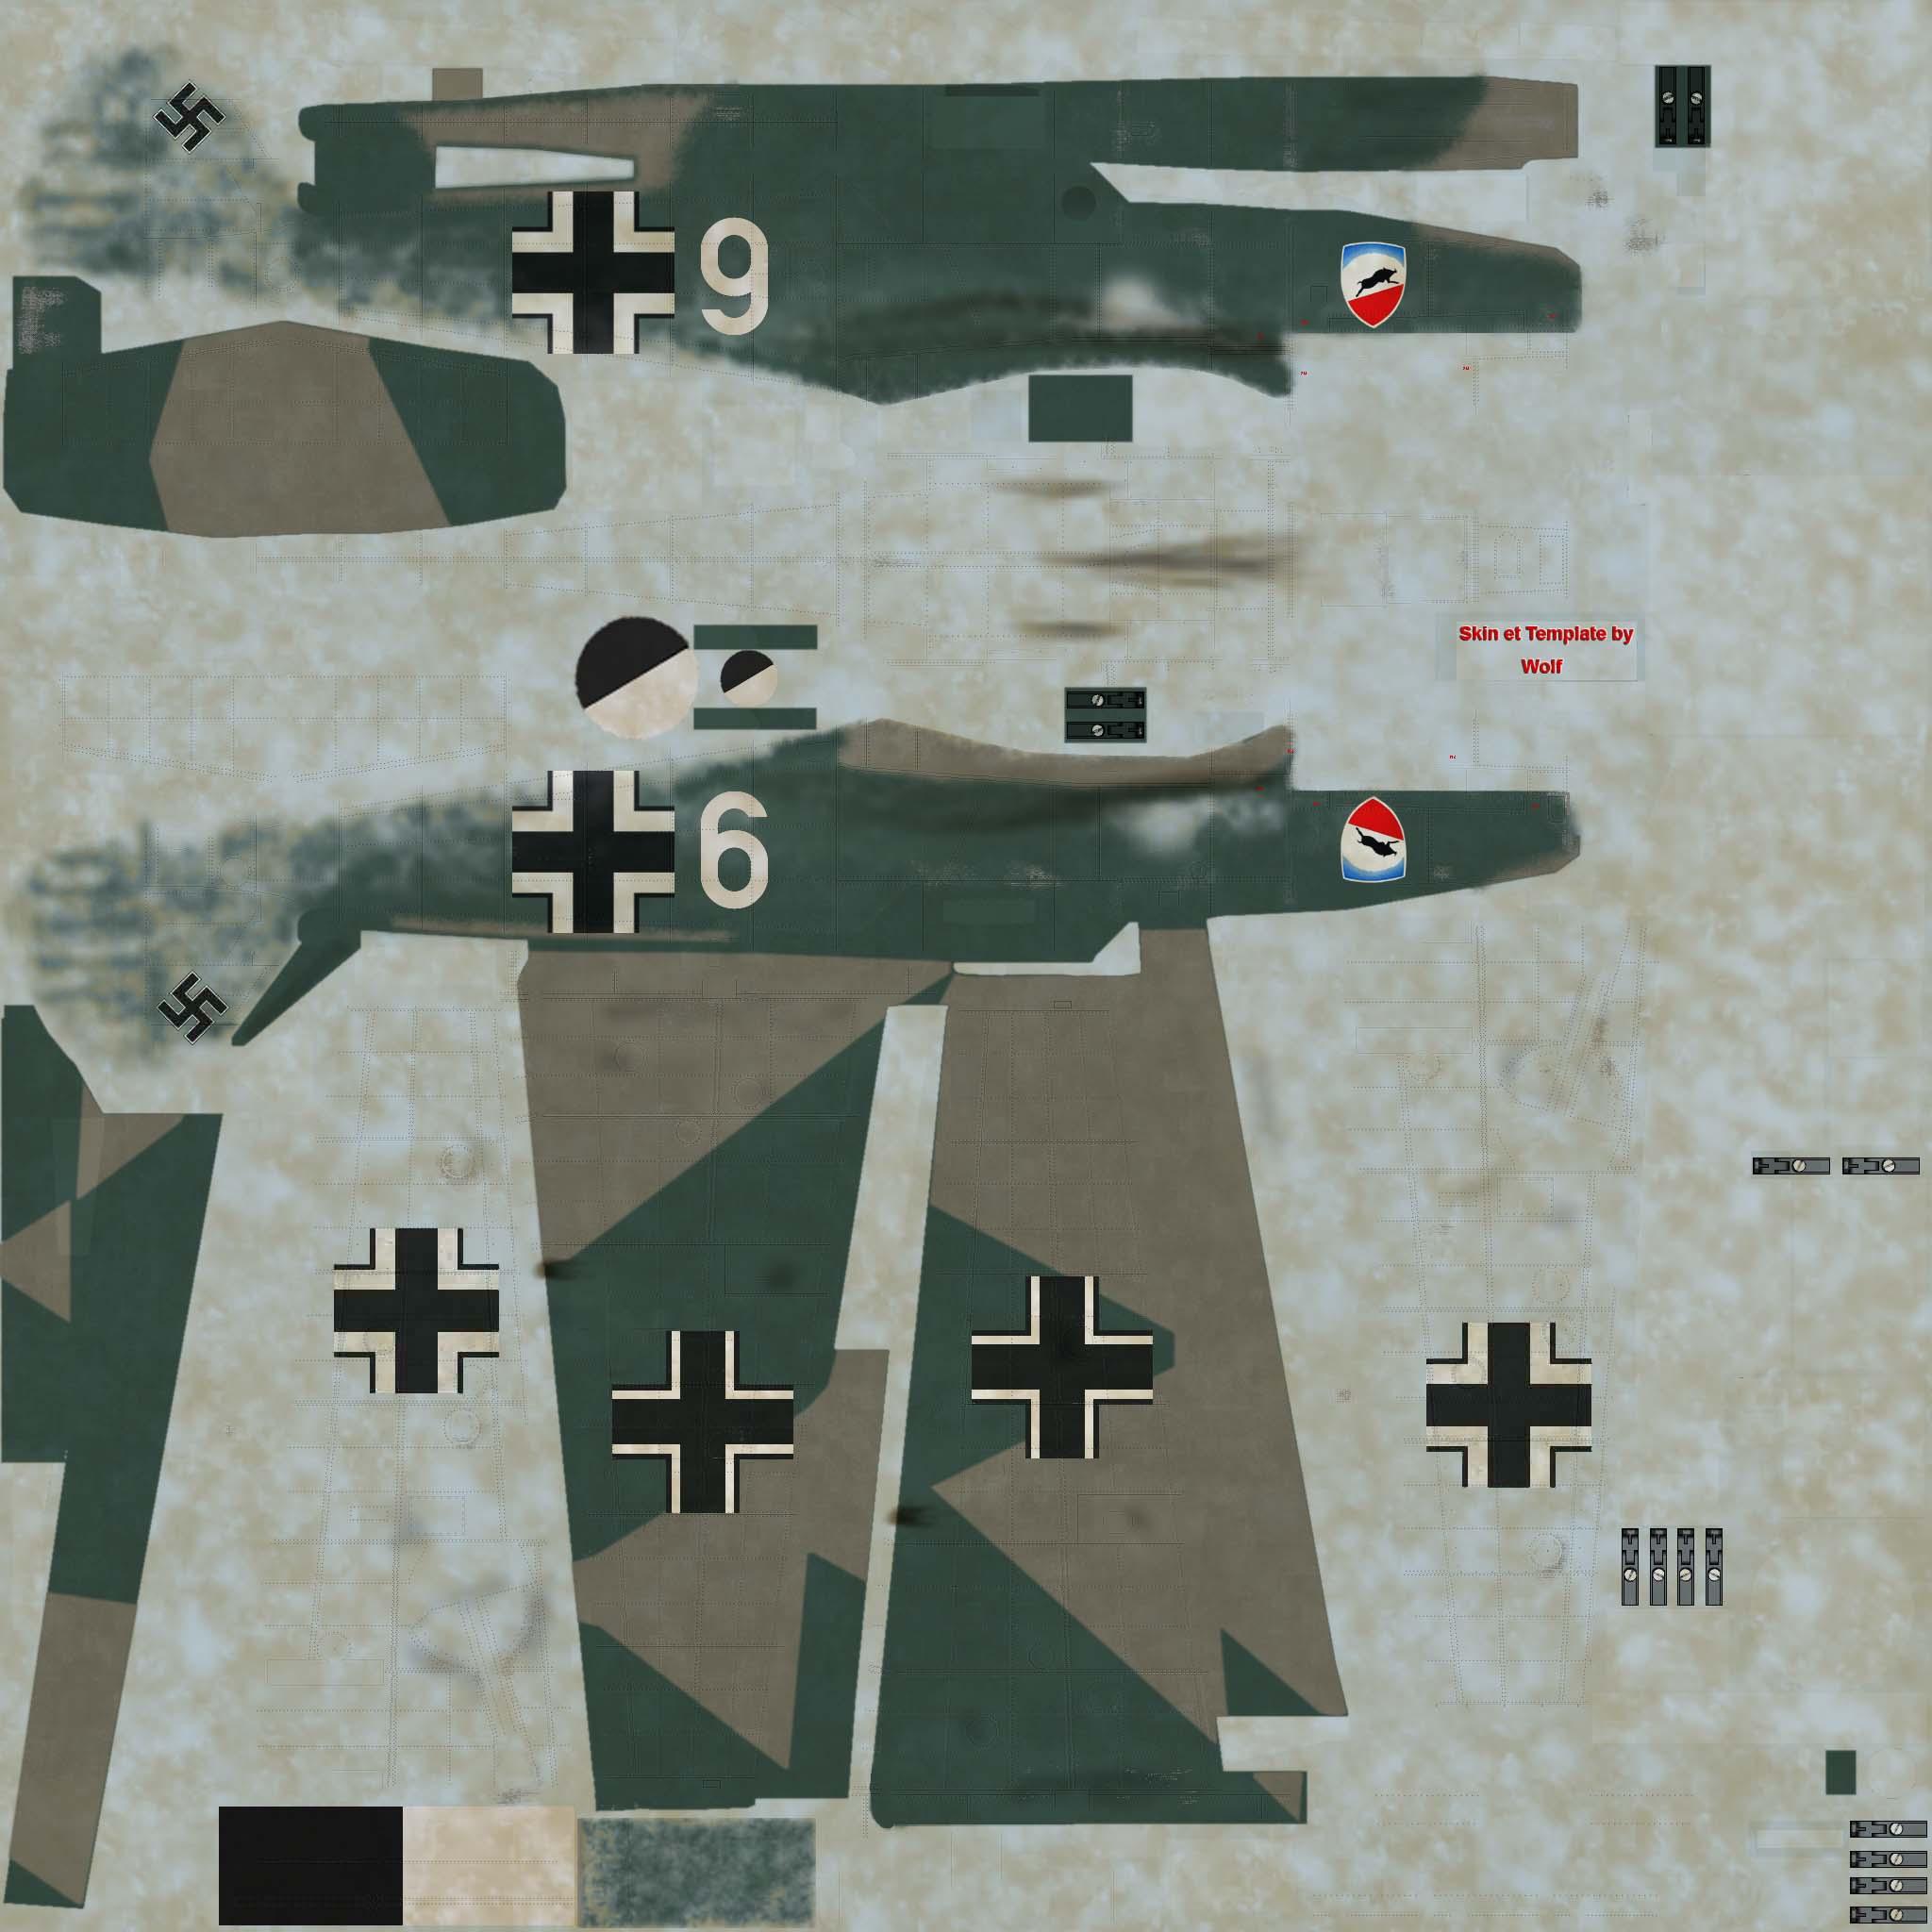 COD OD Bf 109E1 1.JG52 W9 Herbert Bischoff France 1940